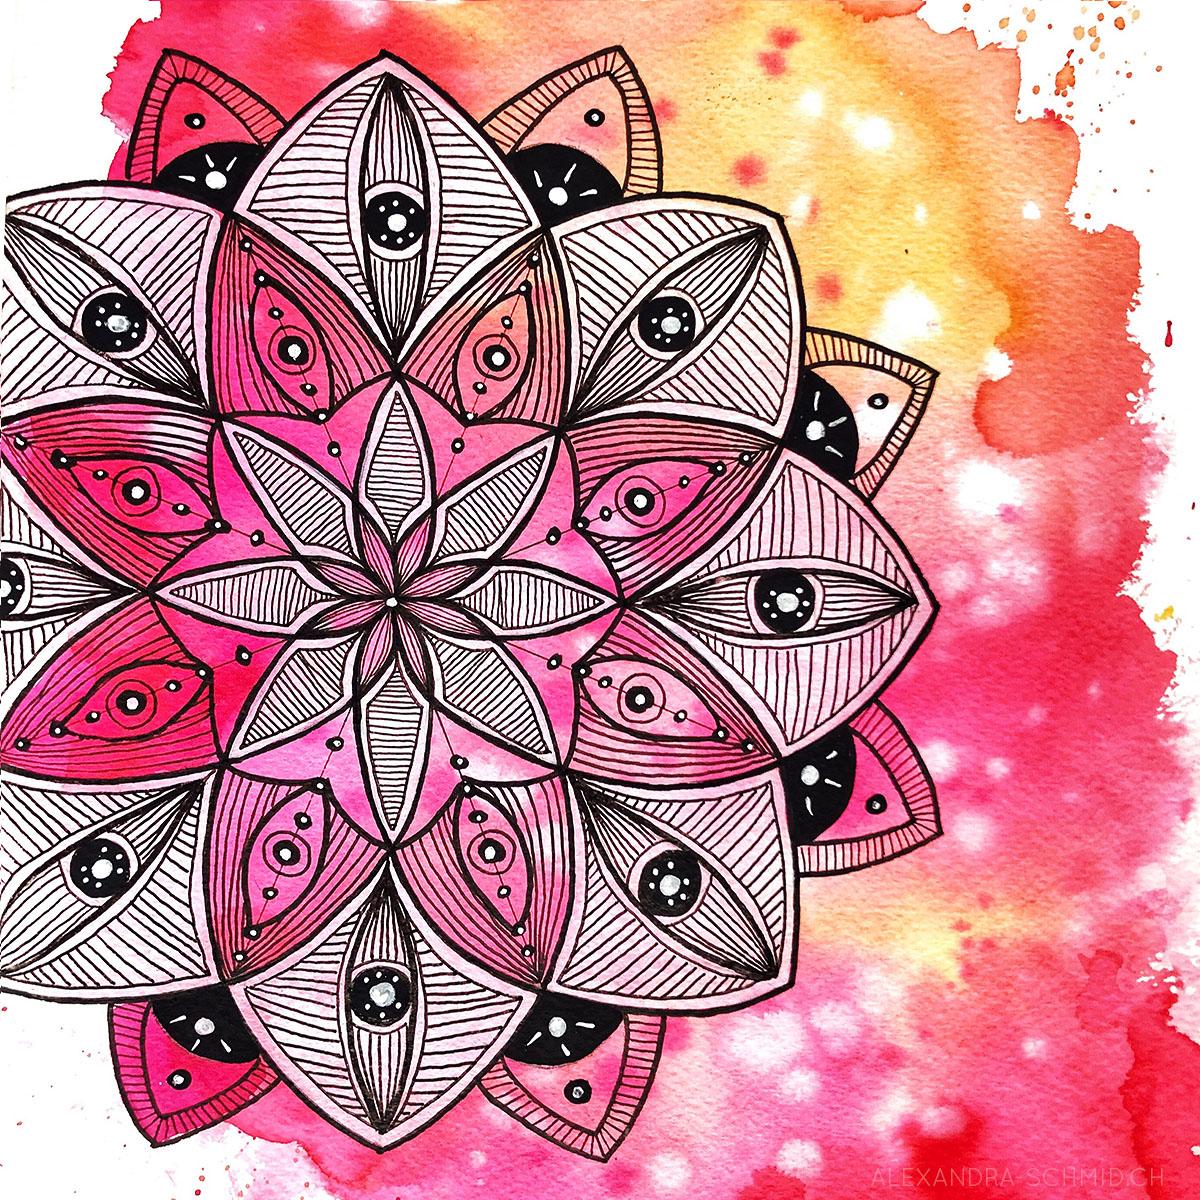 Mandala : flüssige Aquarellfarbe, Acryl, India-Ink und Marker auf Papier